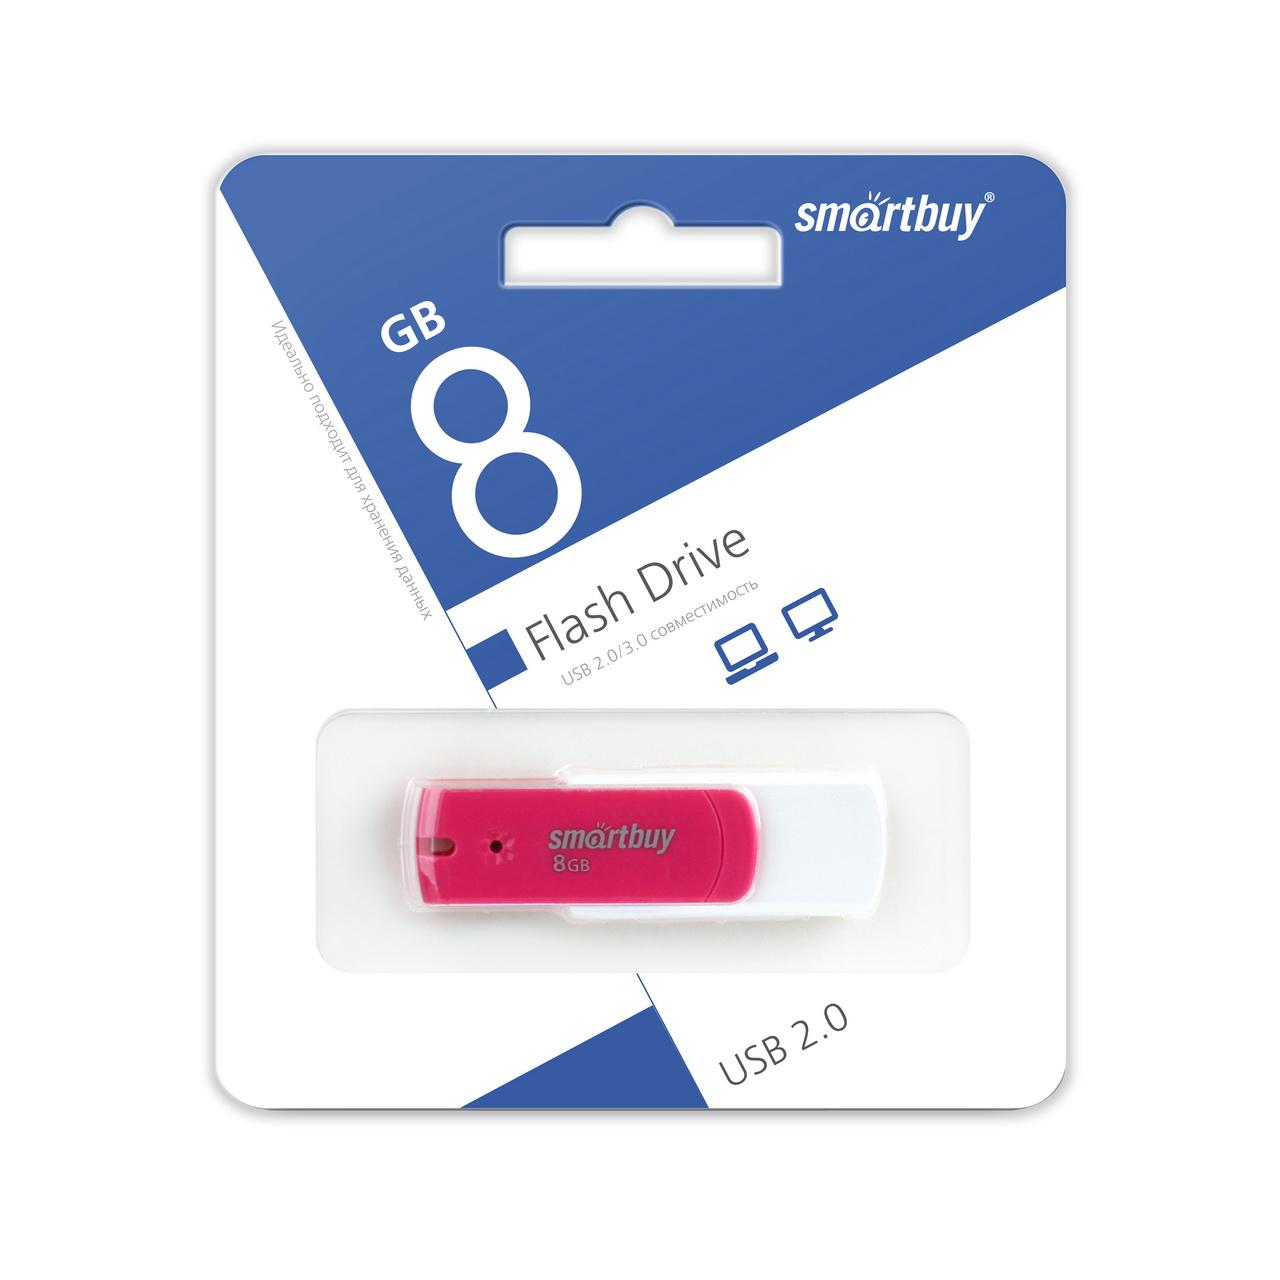 USB 2.0 флэш-диск Smartbuy Diamond Pink 8Gb оптом